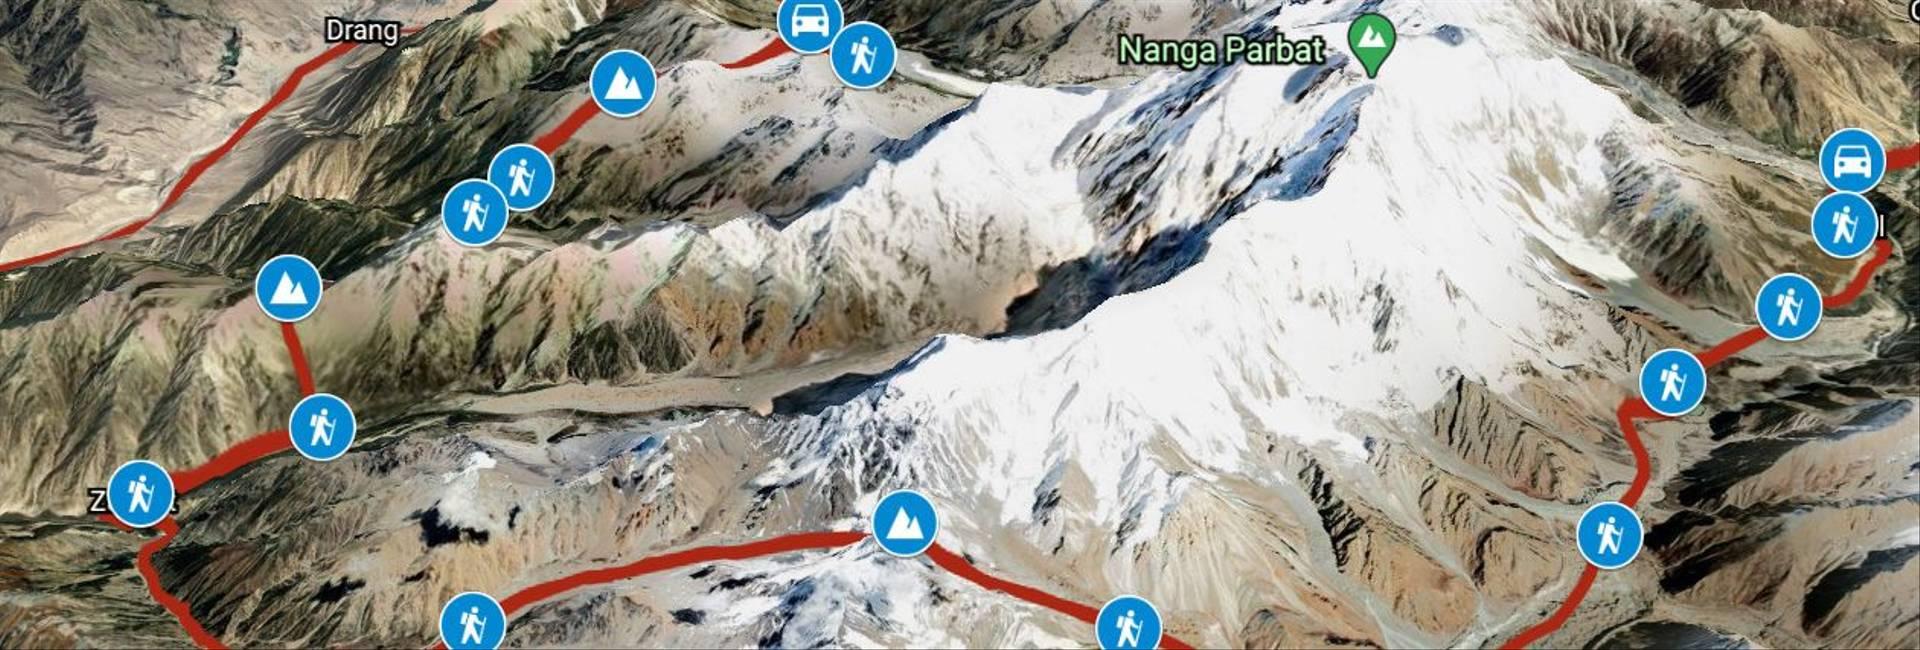 Nanga Parba Circuit photo on Google Earth JPG.jpg